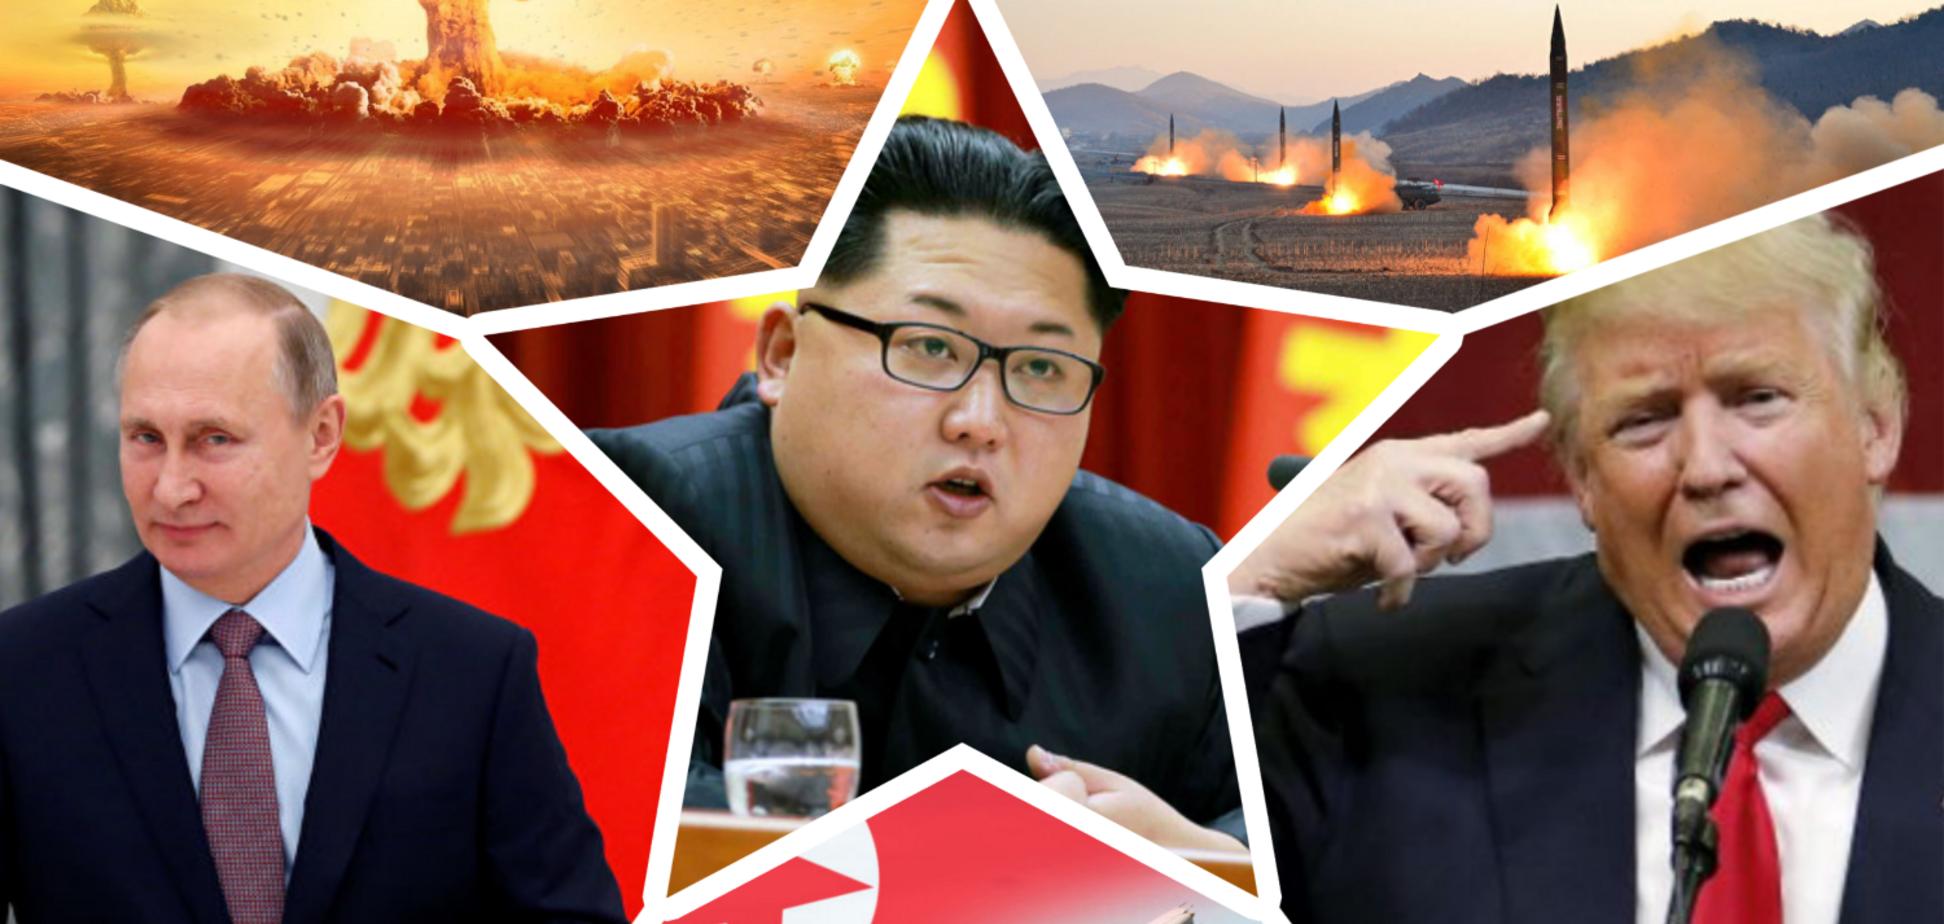 Владимир Путин, Ким Чен Ын, Дональд Трамп